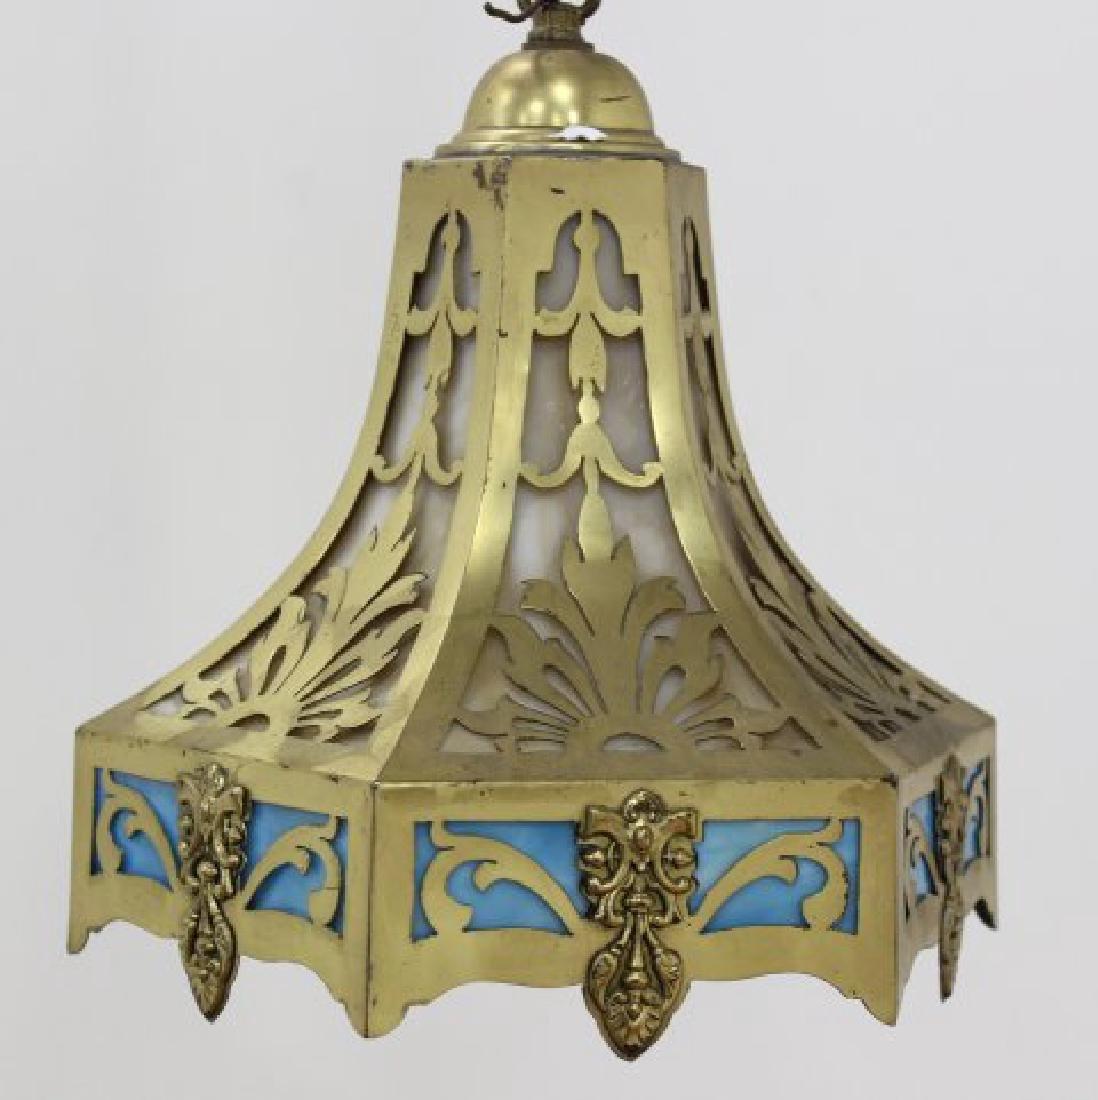 Brass & Slag Glass Ceiling Fixture